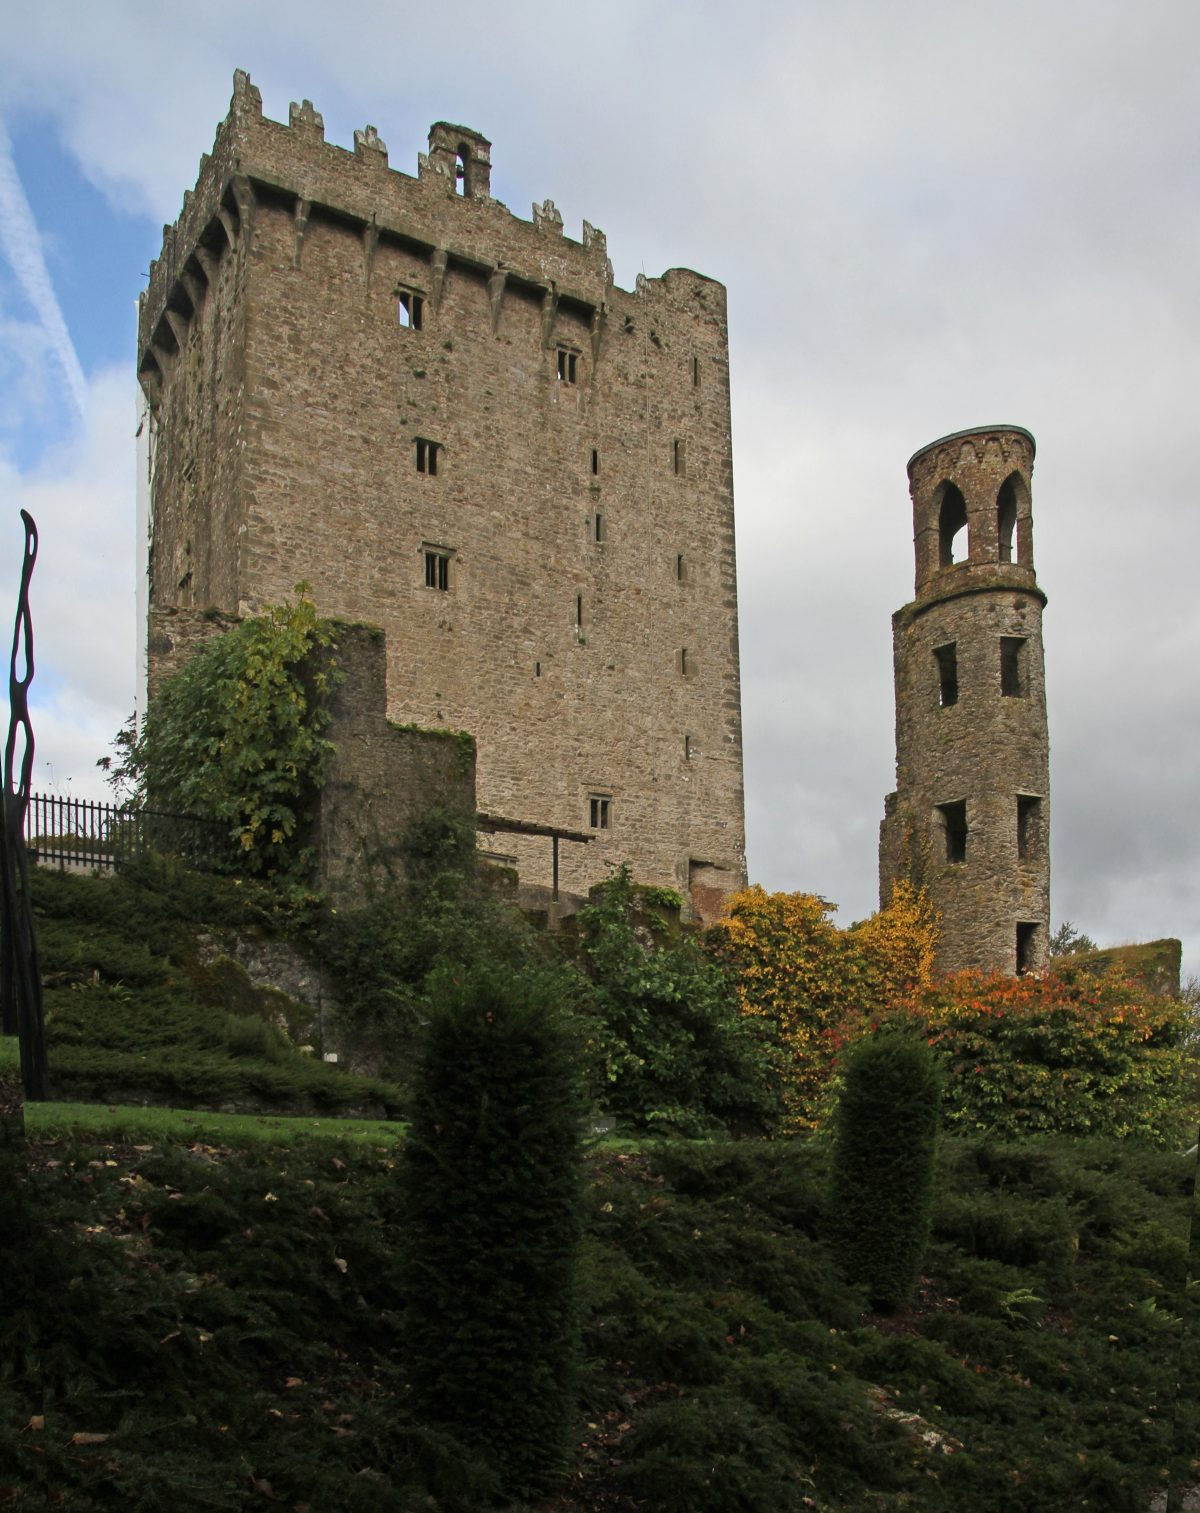 Blarney Castle Gerd Eichmann Wikipedia Commons - 10 Castles That You Should Visit In Ireland